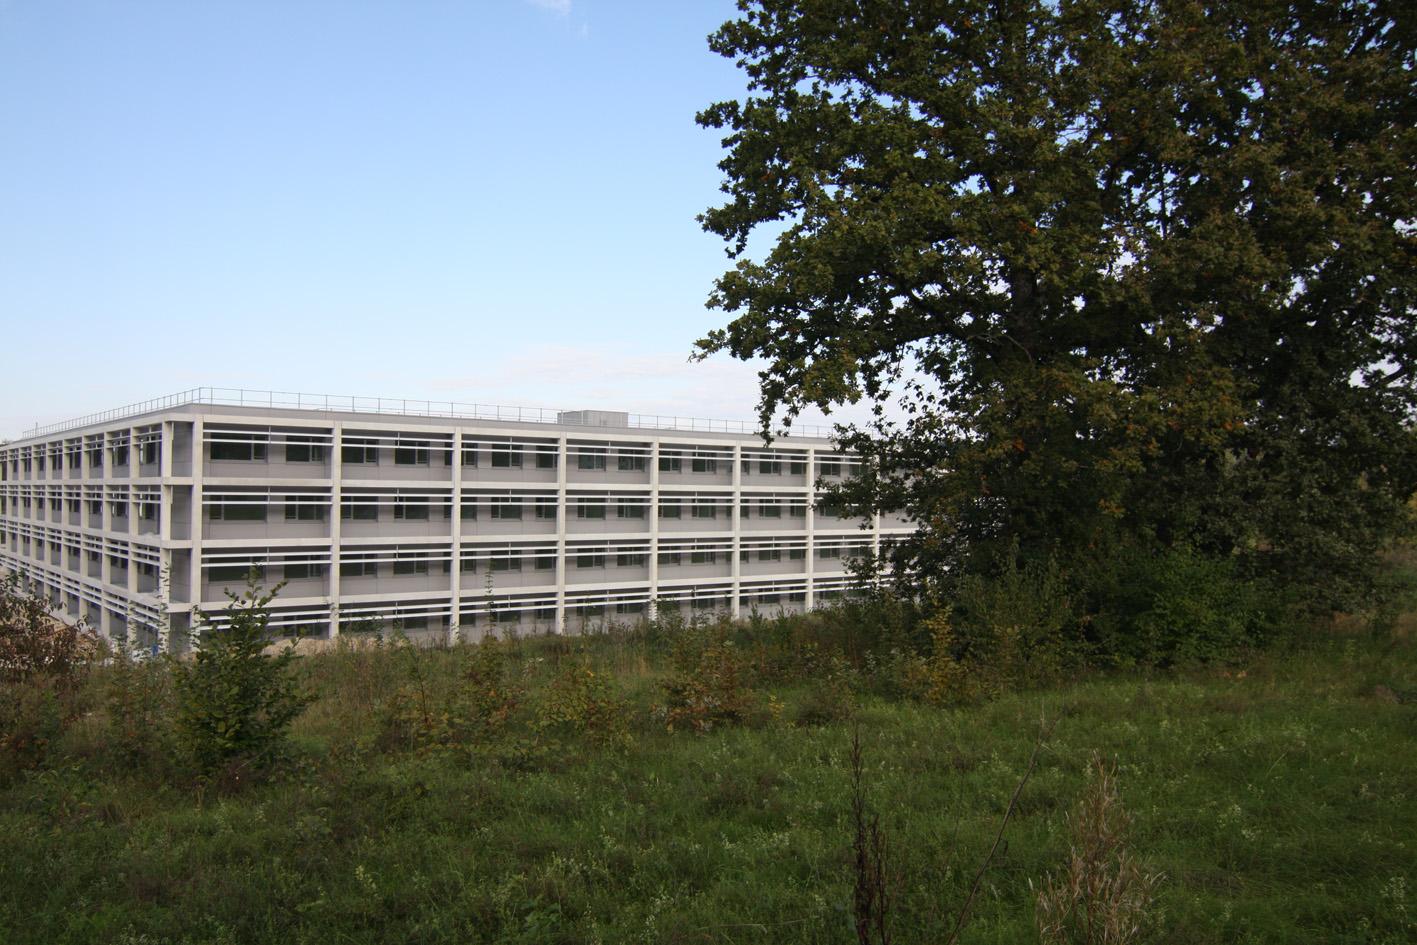 Pöcking, Neubau Lehrsaal- und Funktionsgebäude